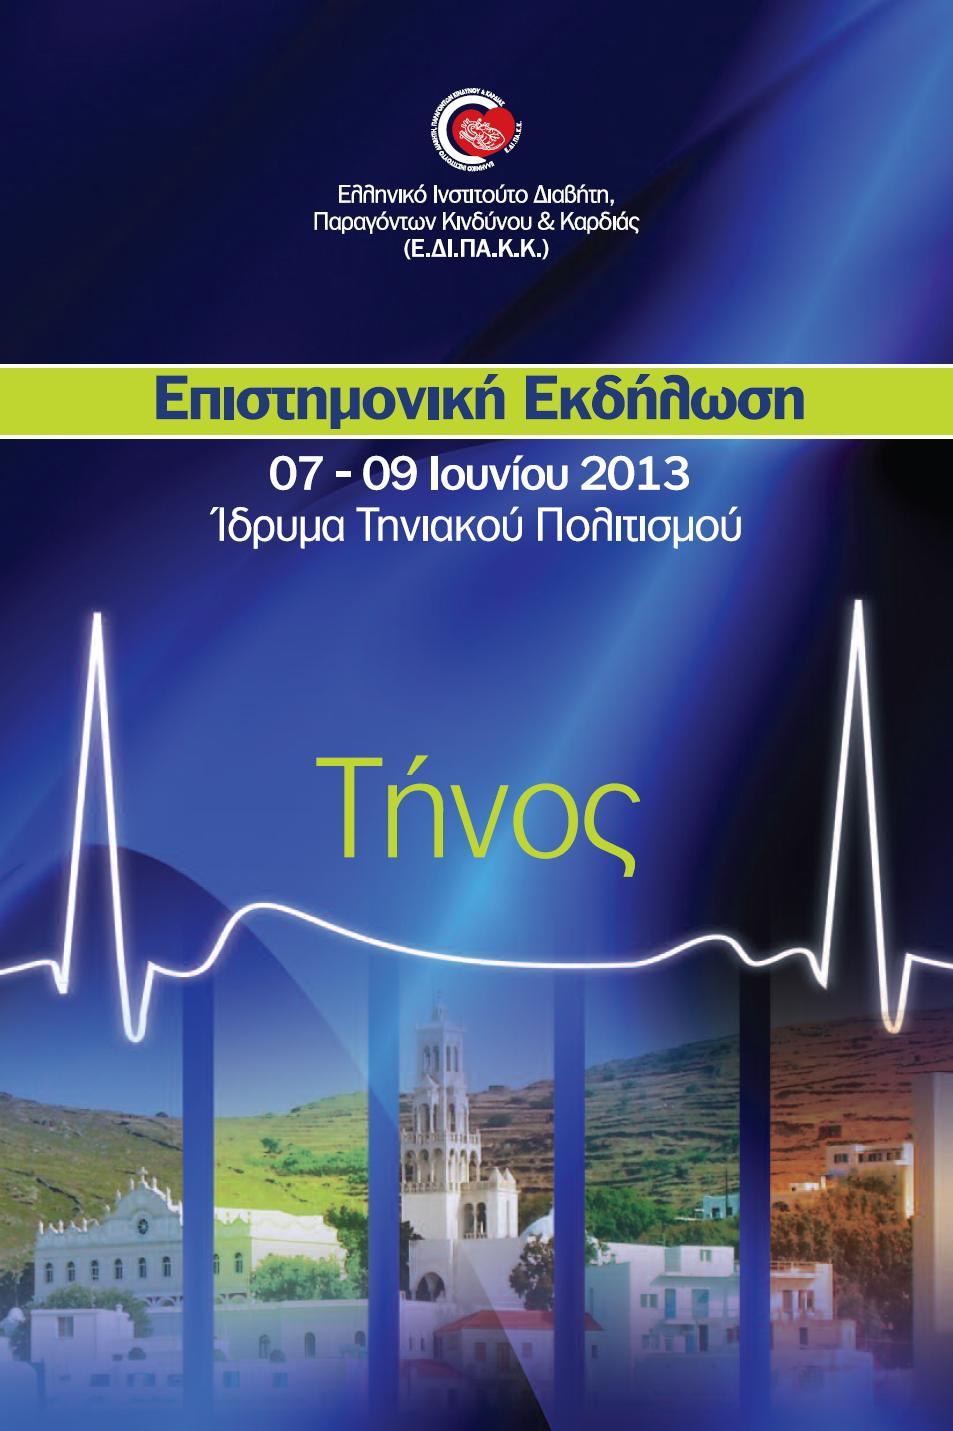 2nd Scientific Event 2013